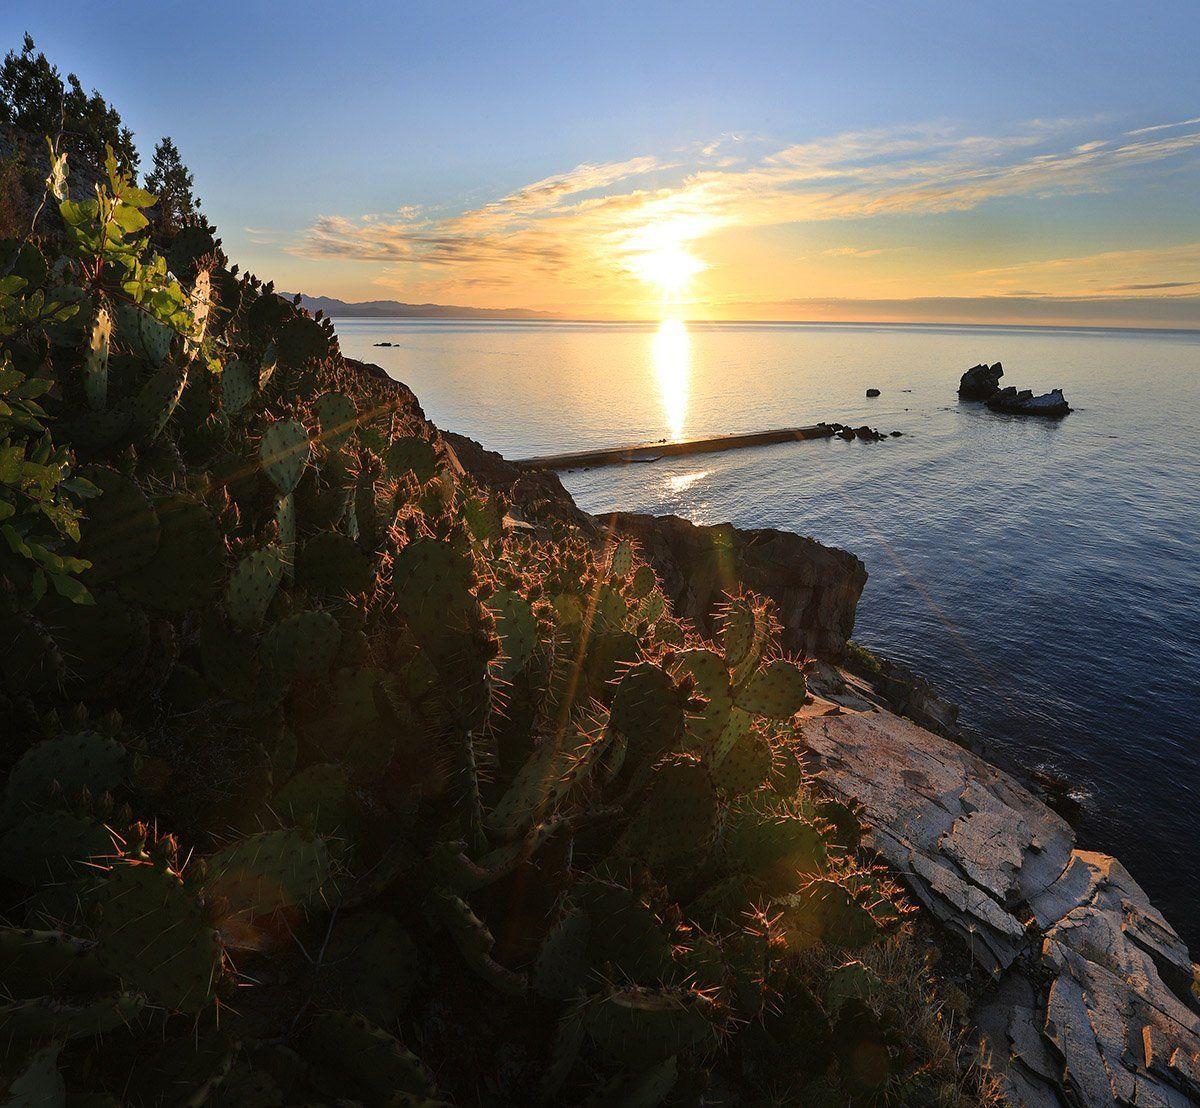 крым, алушта, утес, утес карасан, мыс плака, мыс, кактус, черное море, волна, пляж, пейзажи крыма, Titov Serge